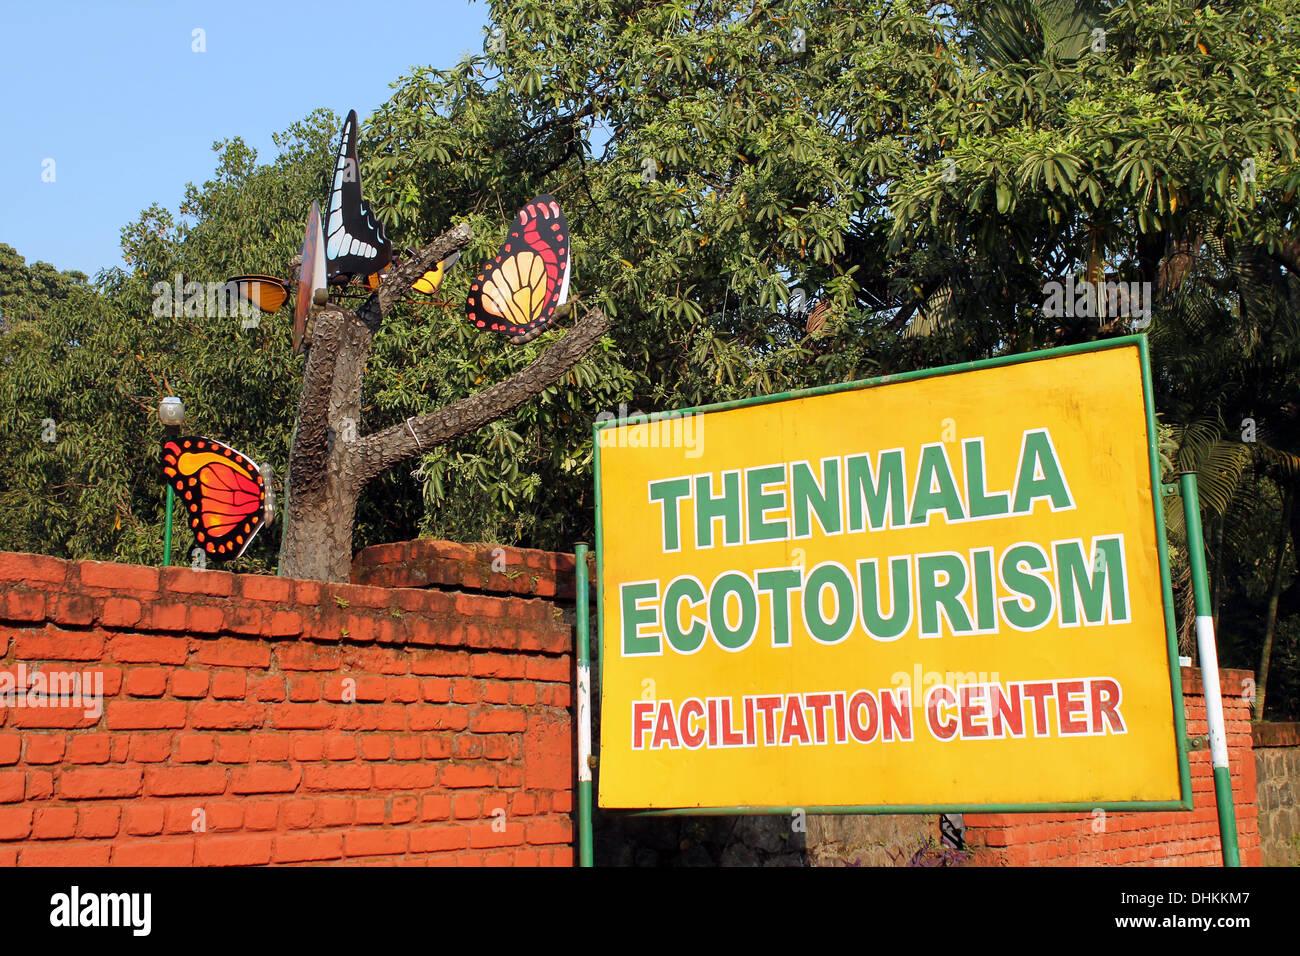 Entrance to Thenmala Ecotourism facilitation center - Stock Image